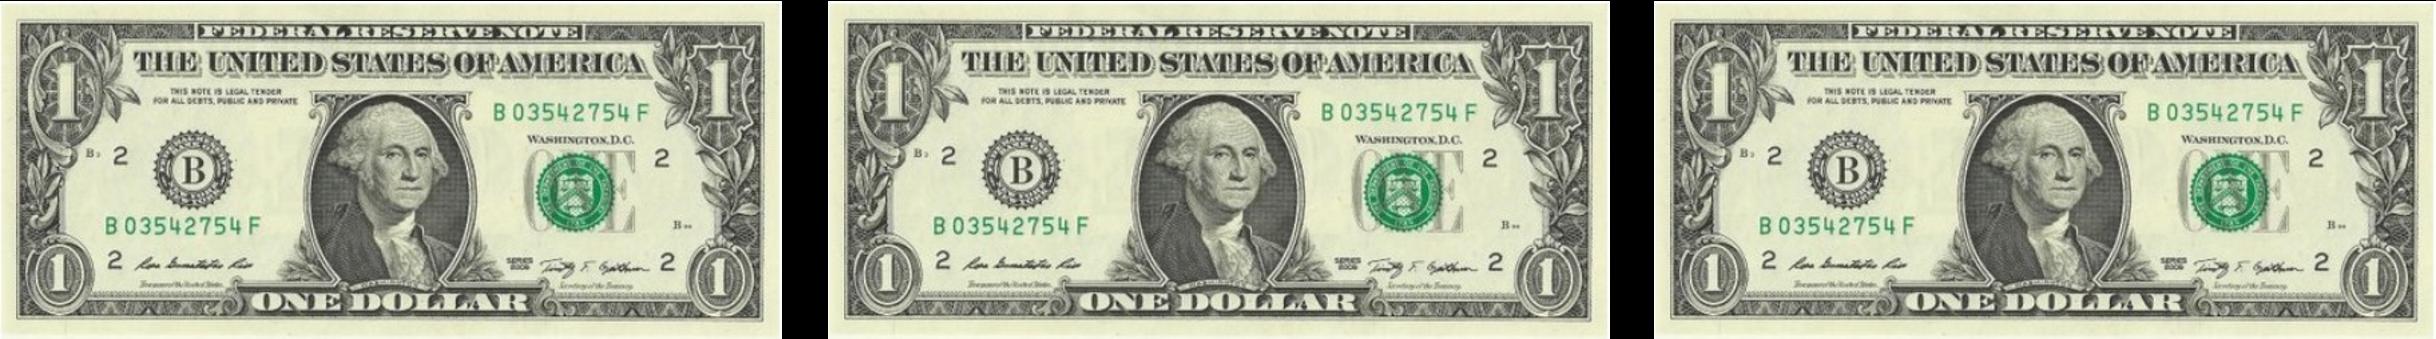 3 1 dollar bills